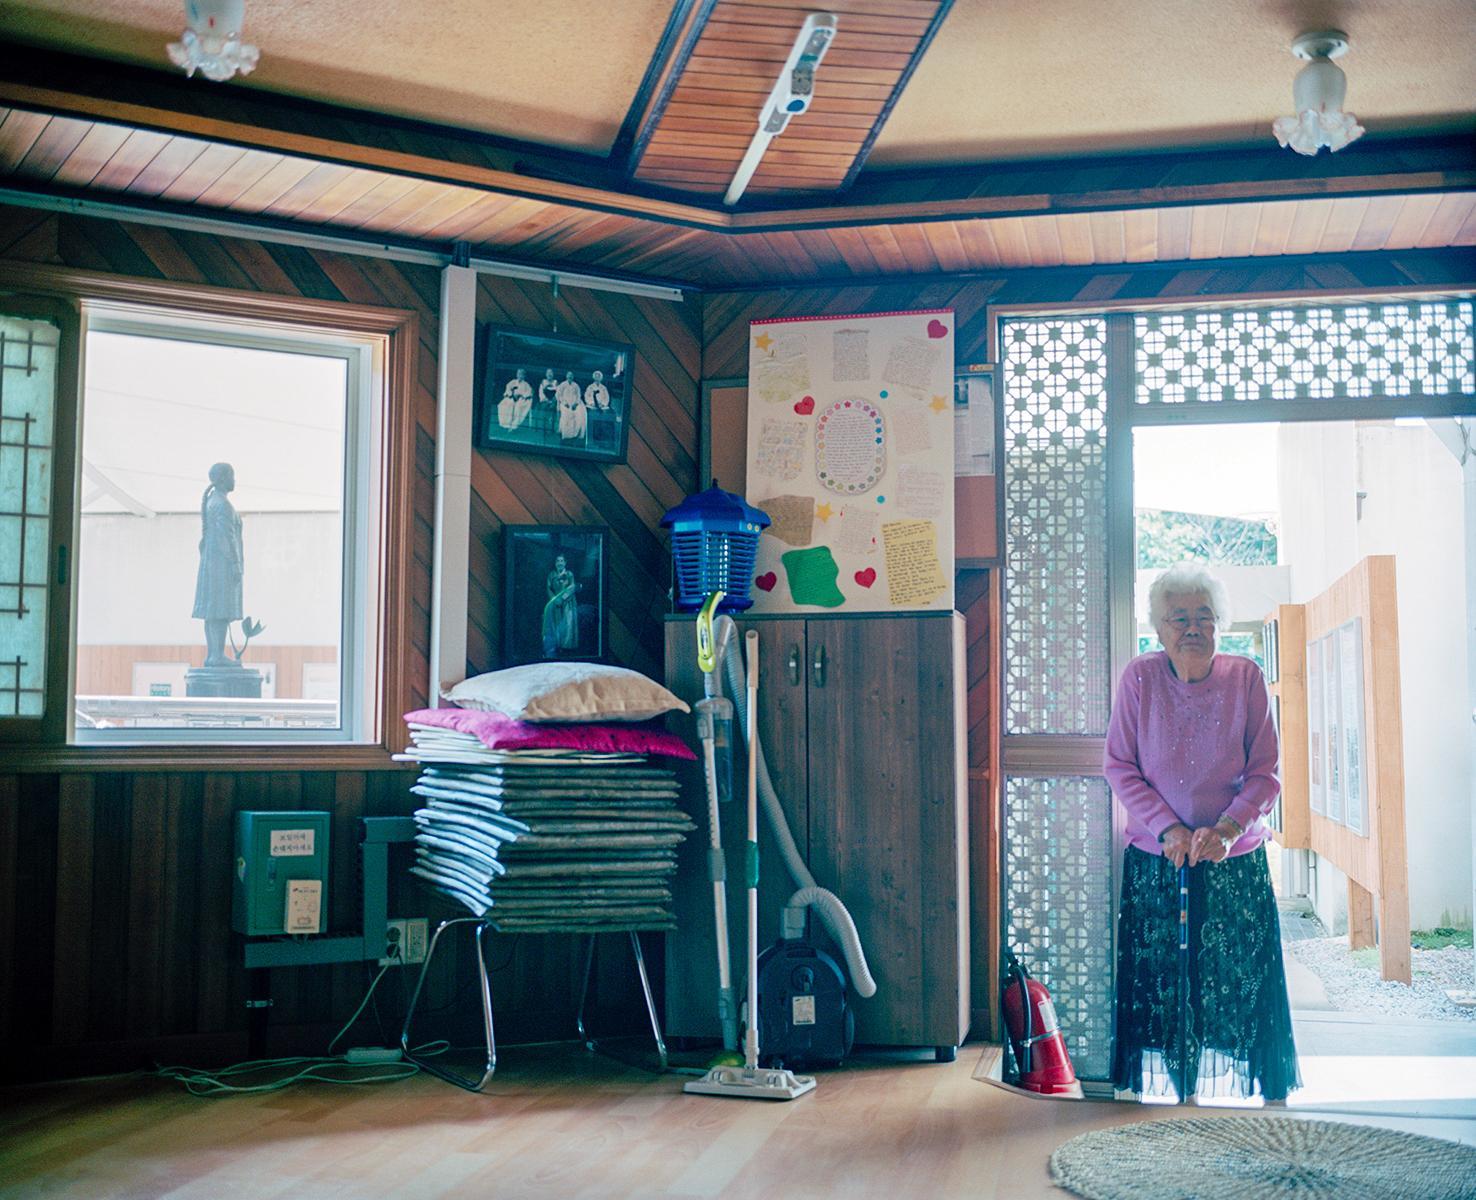 Lee Ok Seon Halmoni in the doorway, House of Sharing, Gwangju, South Korea, 2010